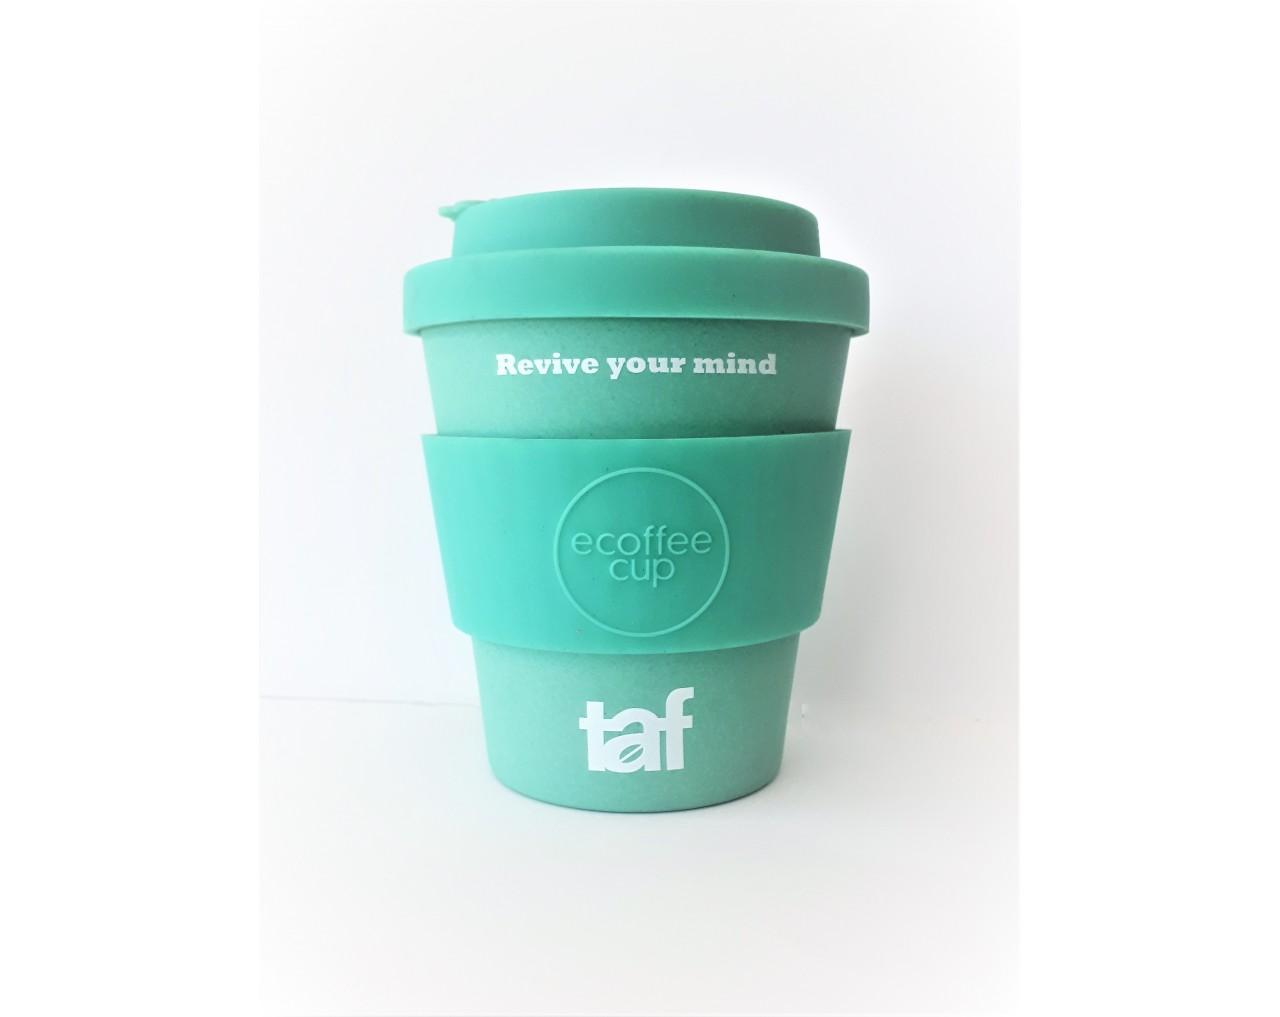 Taf Ecoffee Cup 12oz Turquoise